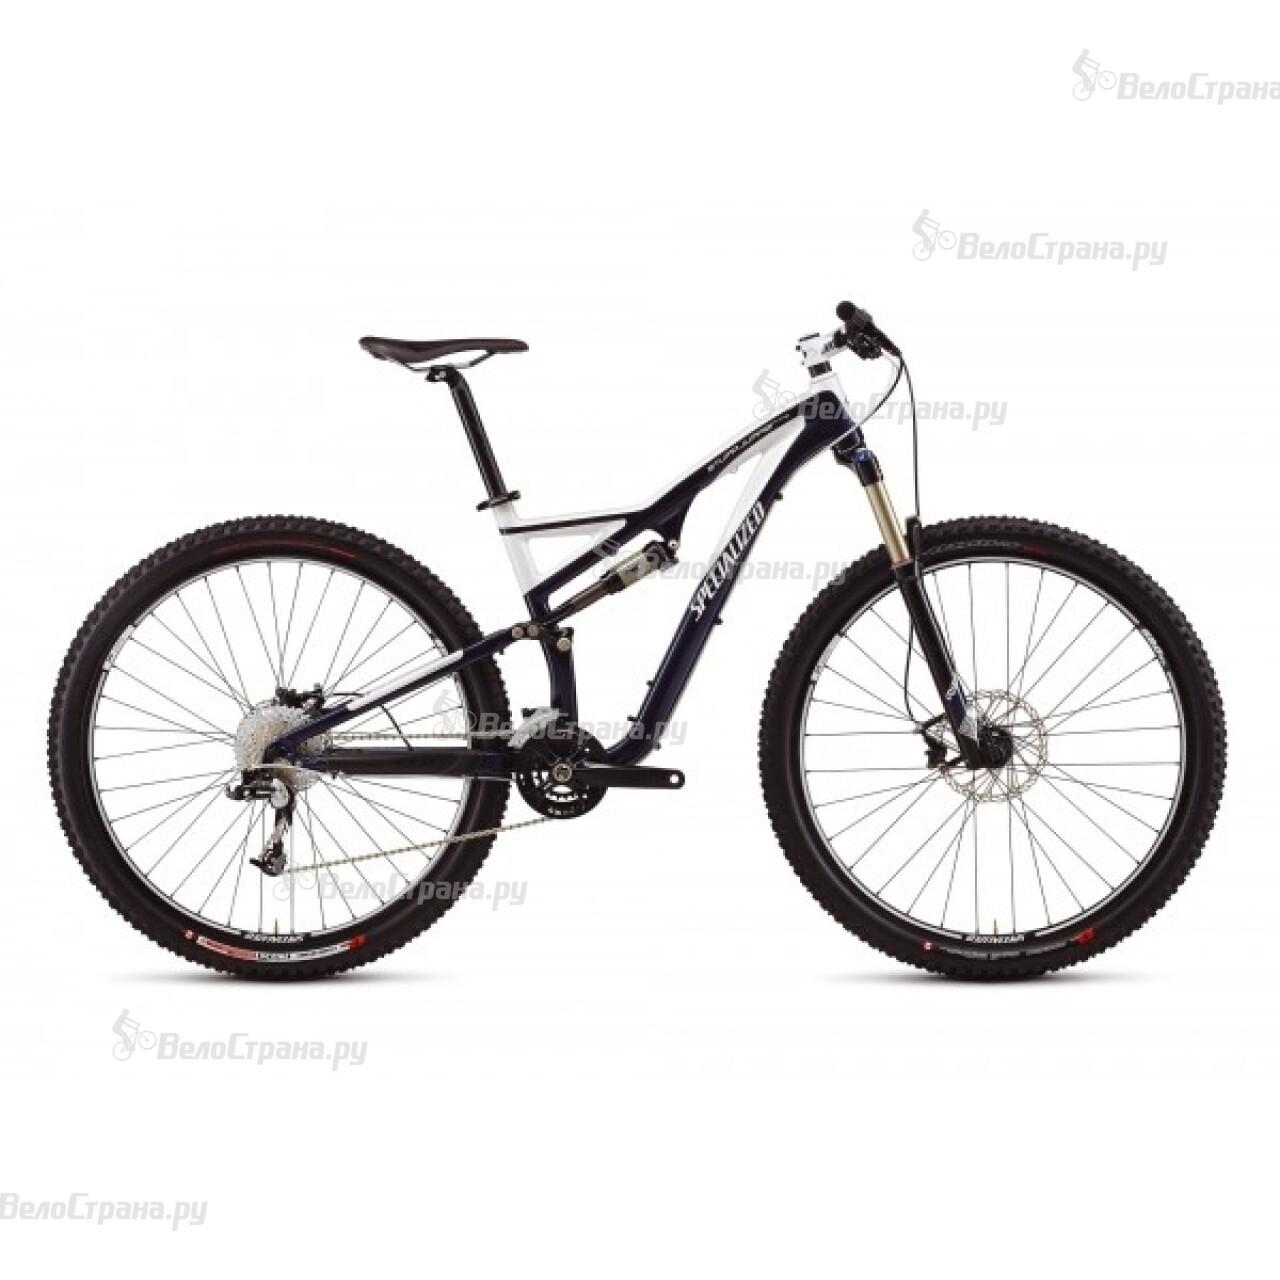 Велосипед Specialized STUMPJUMPER FSR COMP 29 (2013) manitou marvel comp 29